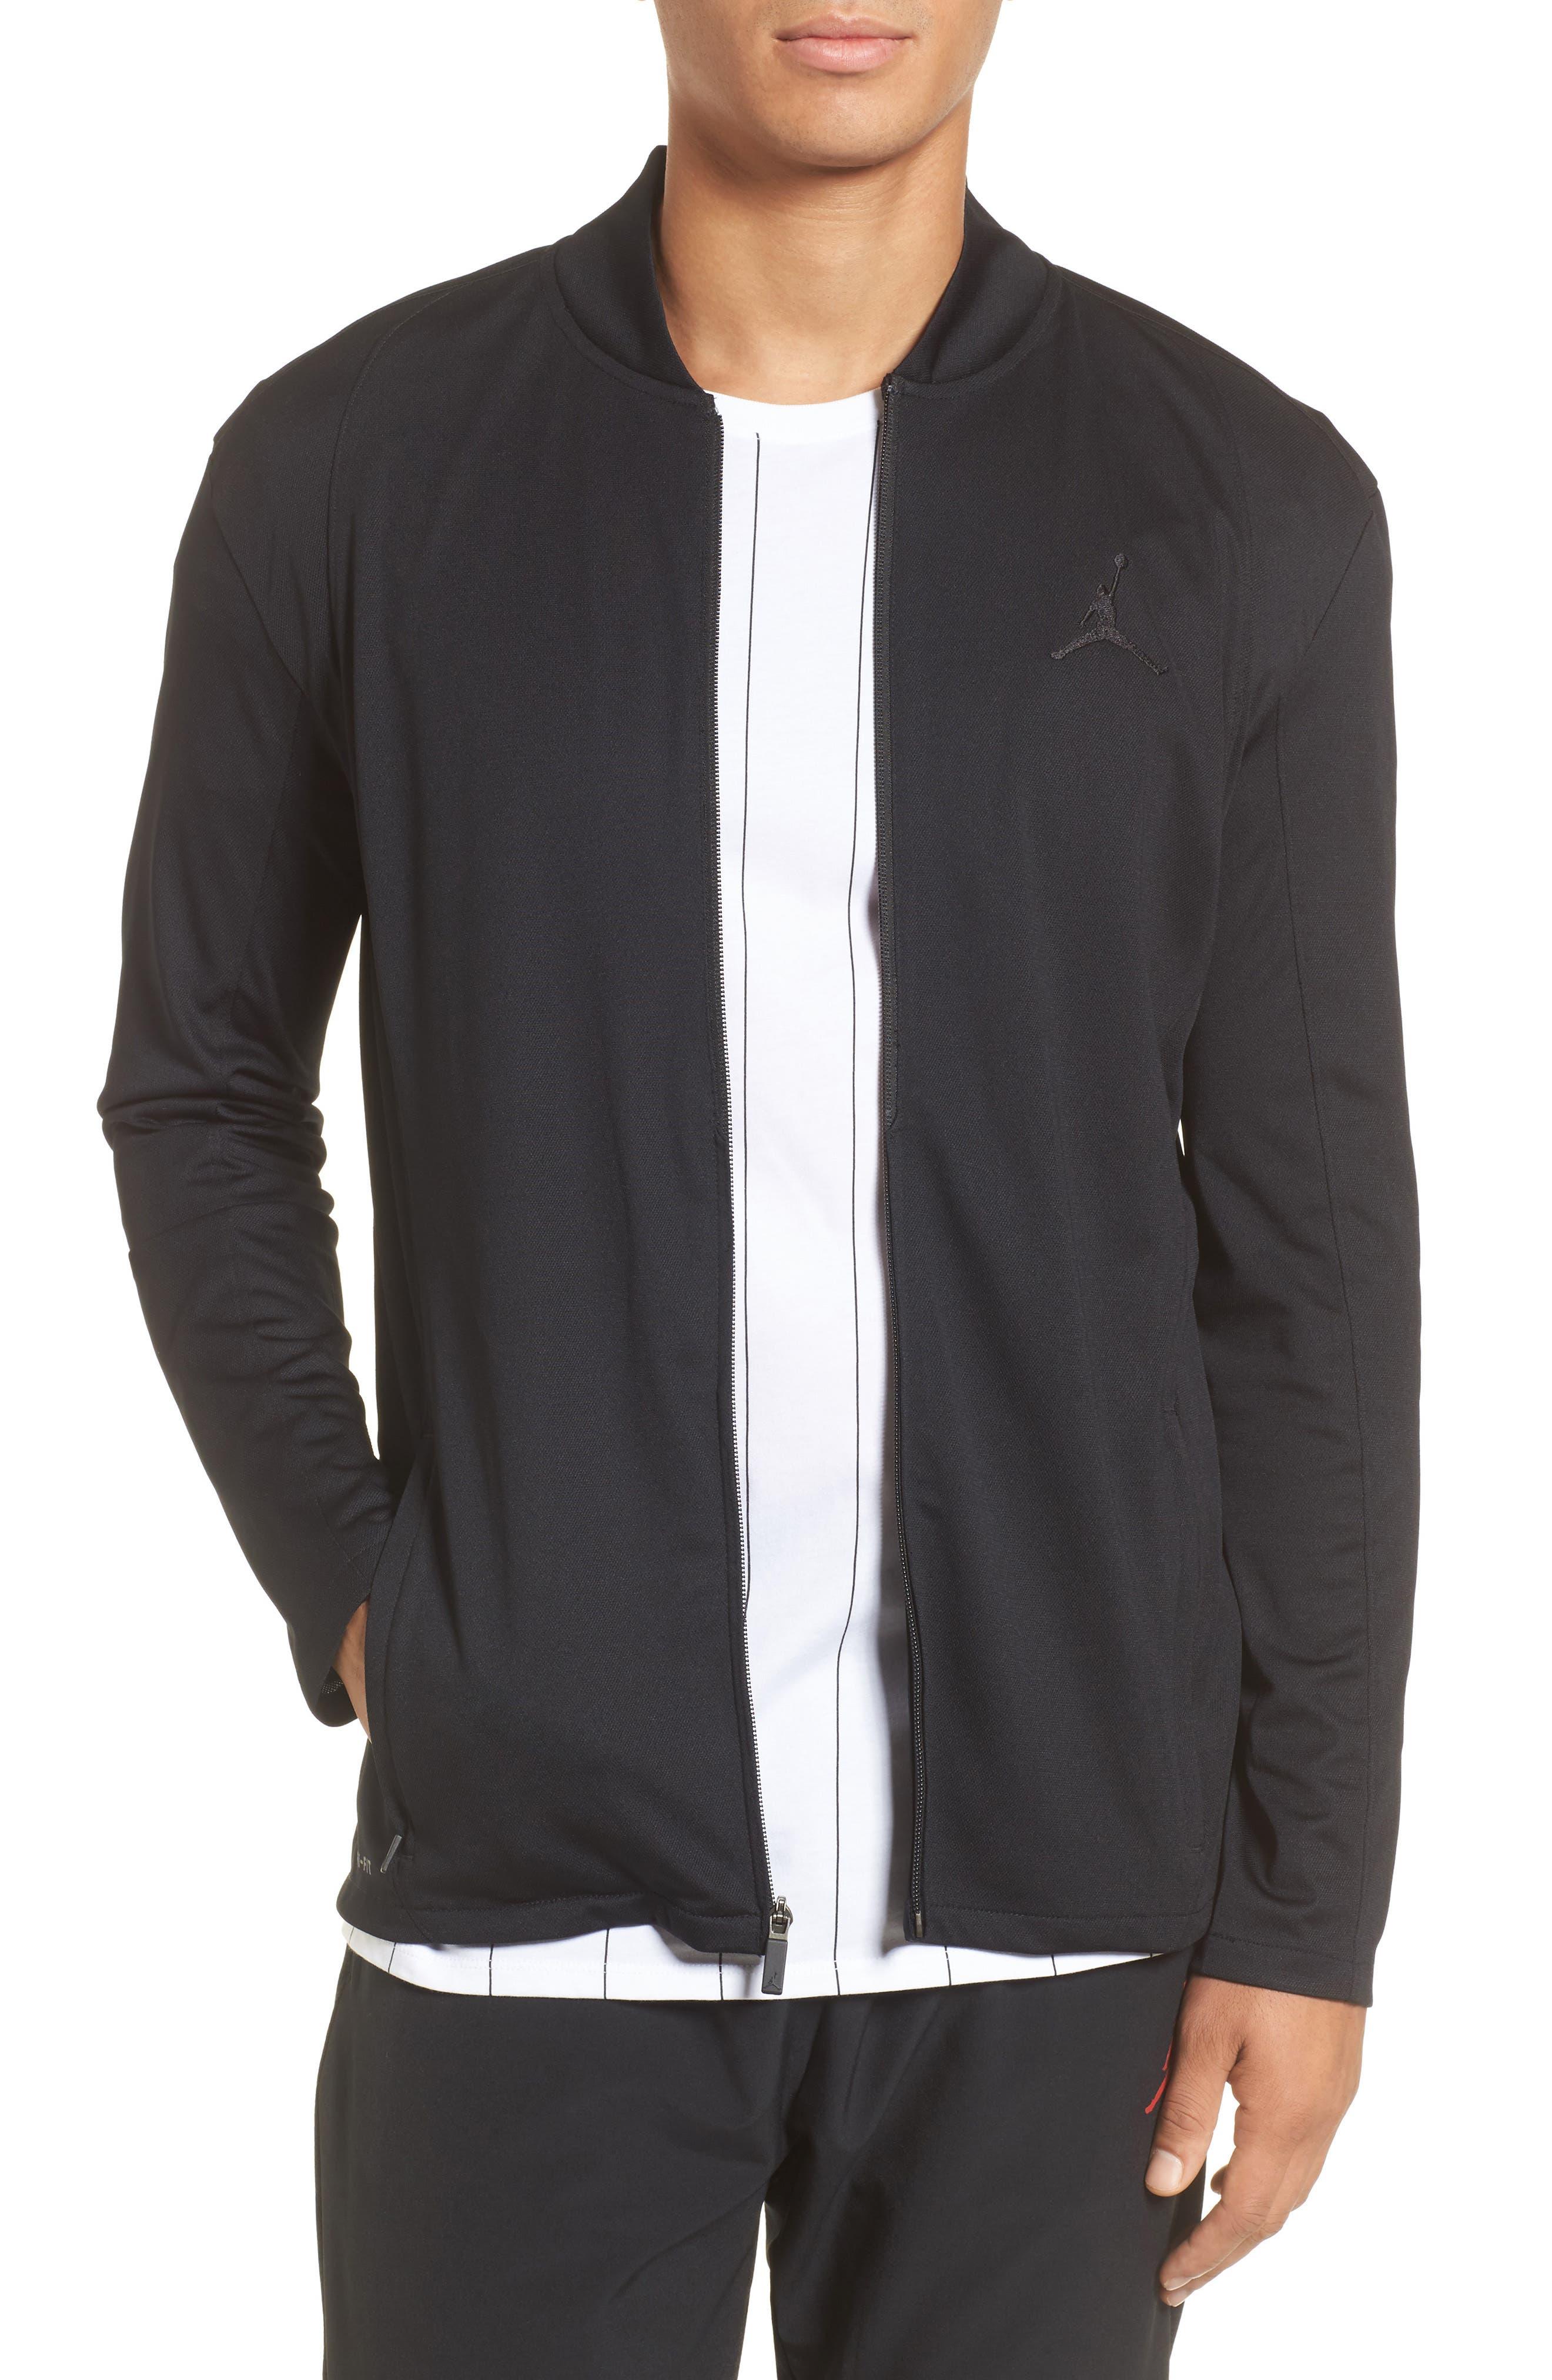 Ultimate Flight Zip Jacket,                         Main,                         color, 010